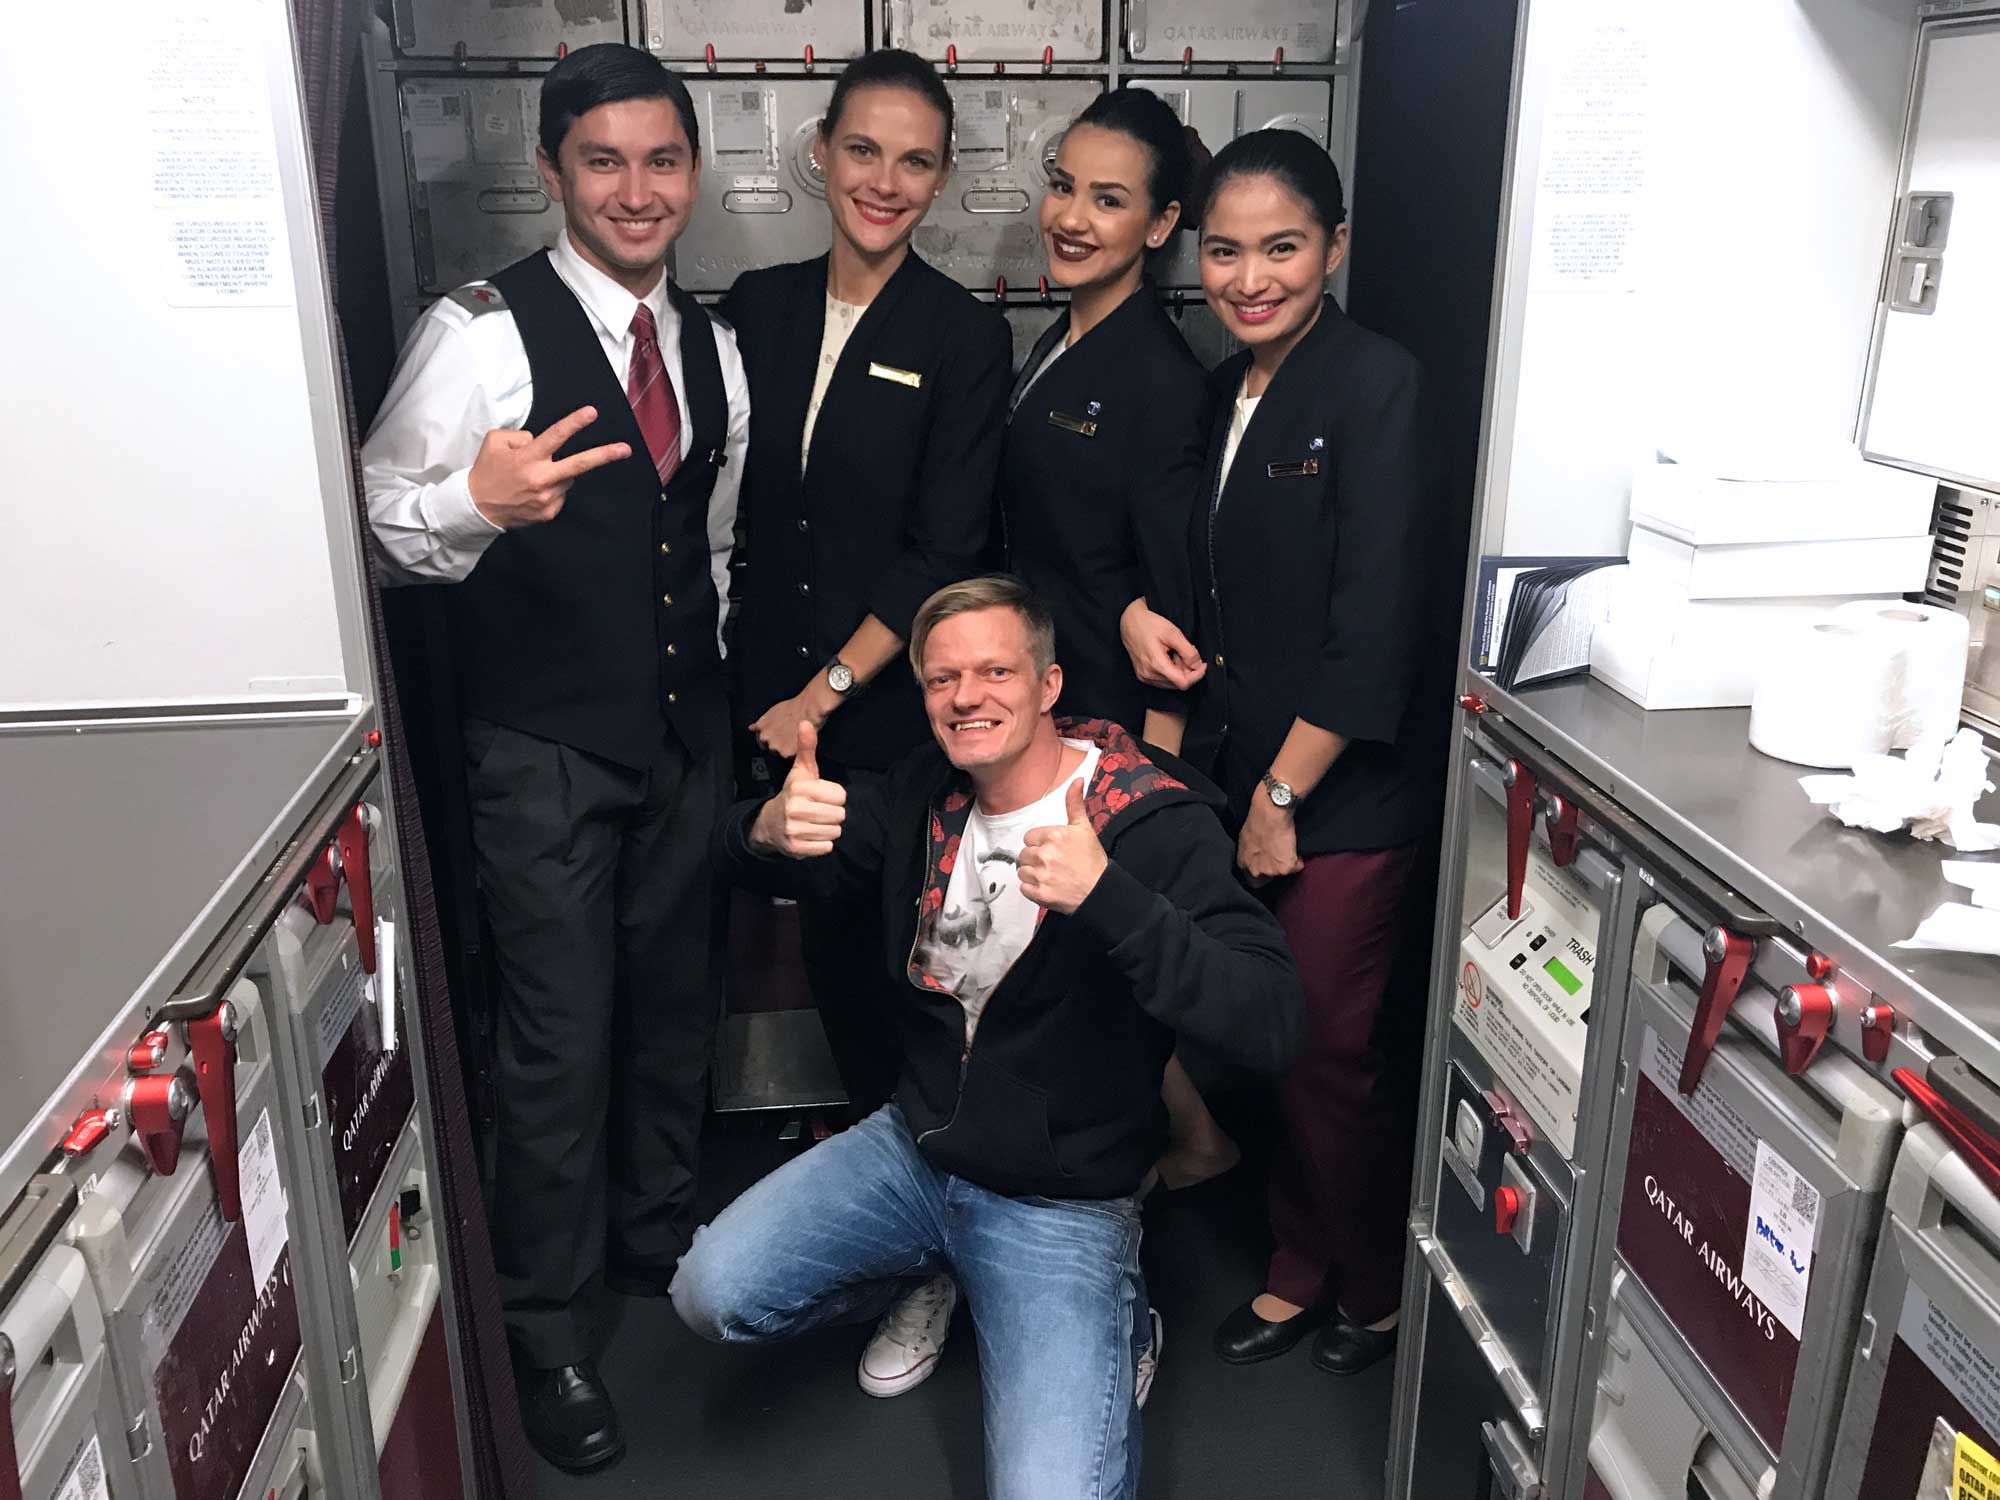 Qatar Airways QR960 - Cabin Crew - Doha to Denpasar Bali - Travel - Blog - Screw Them All